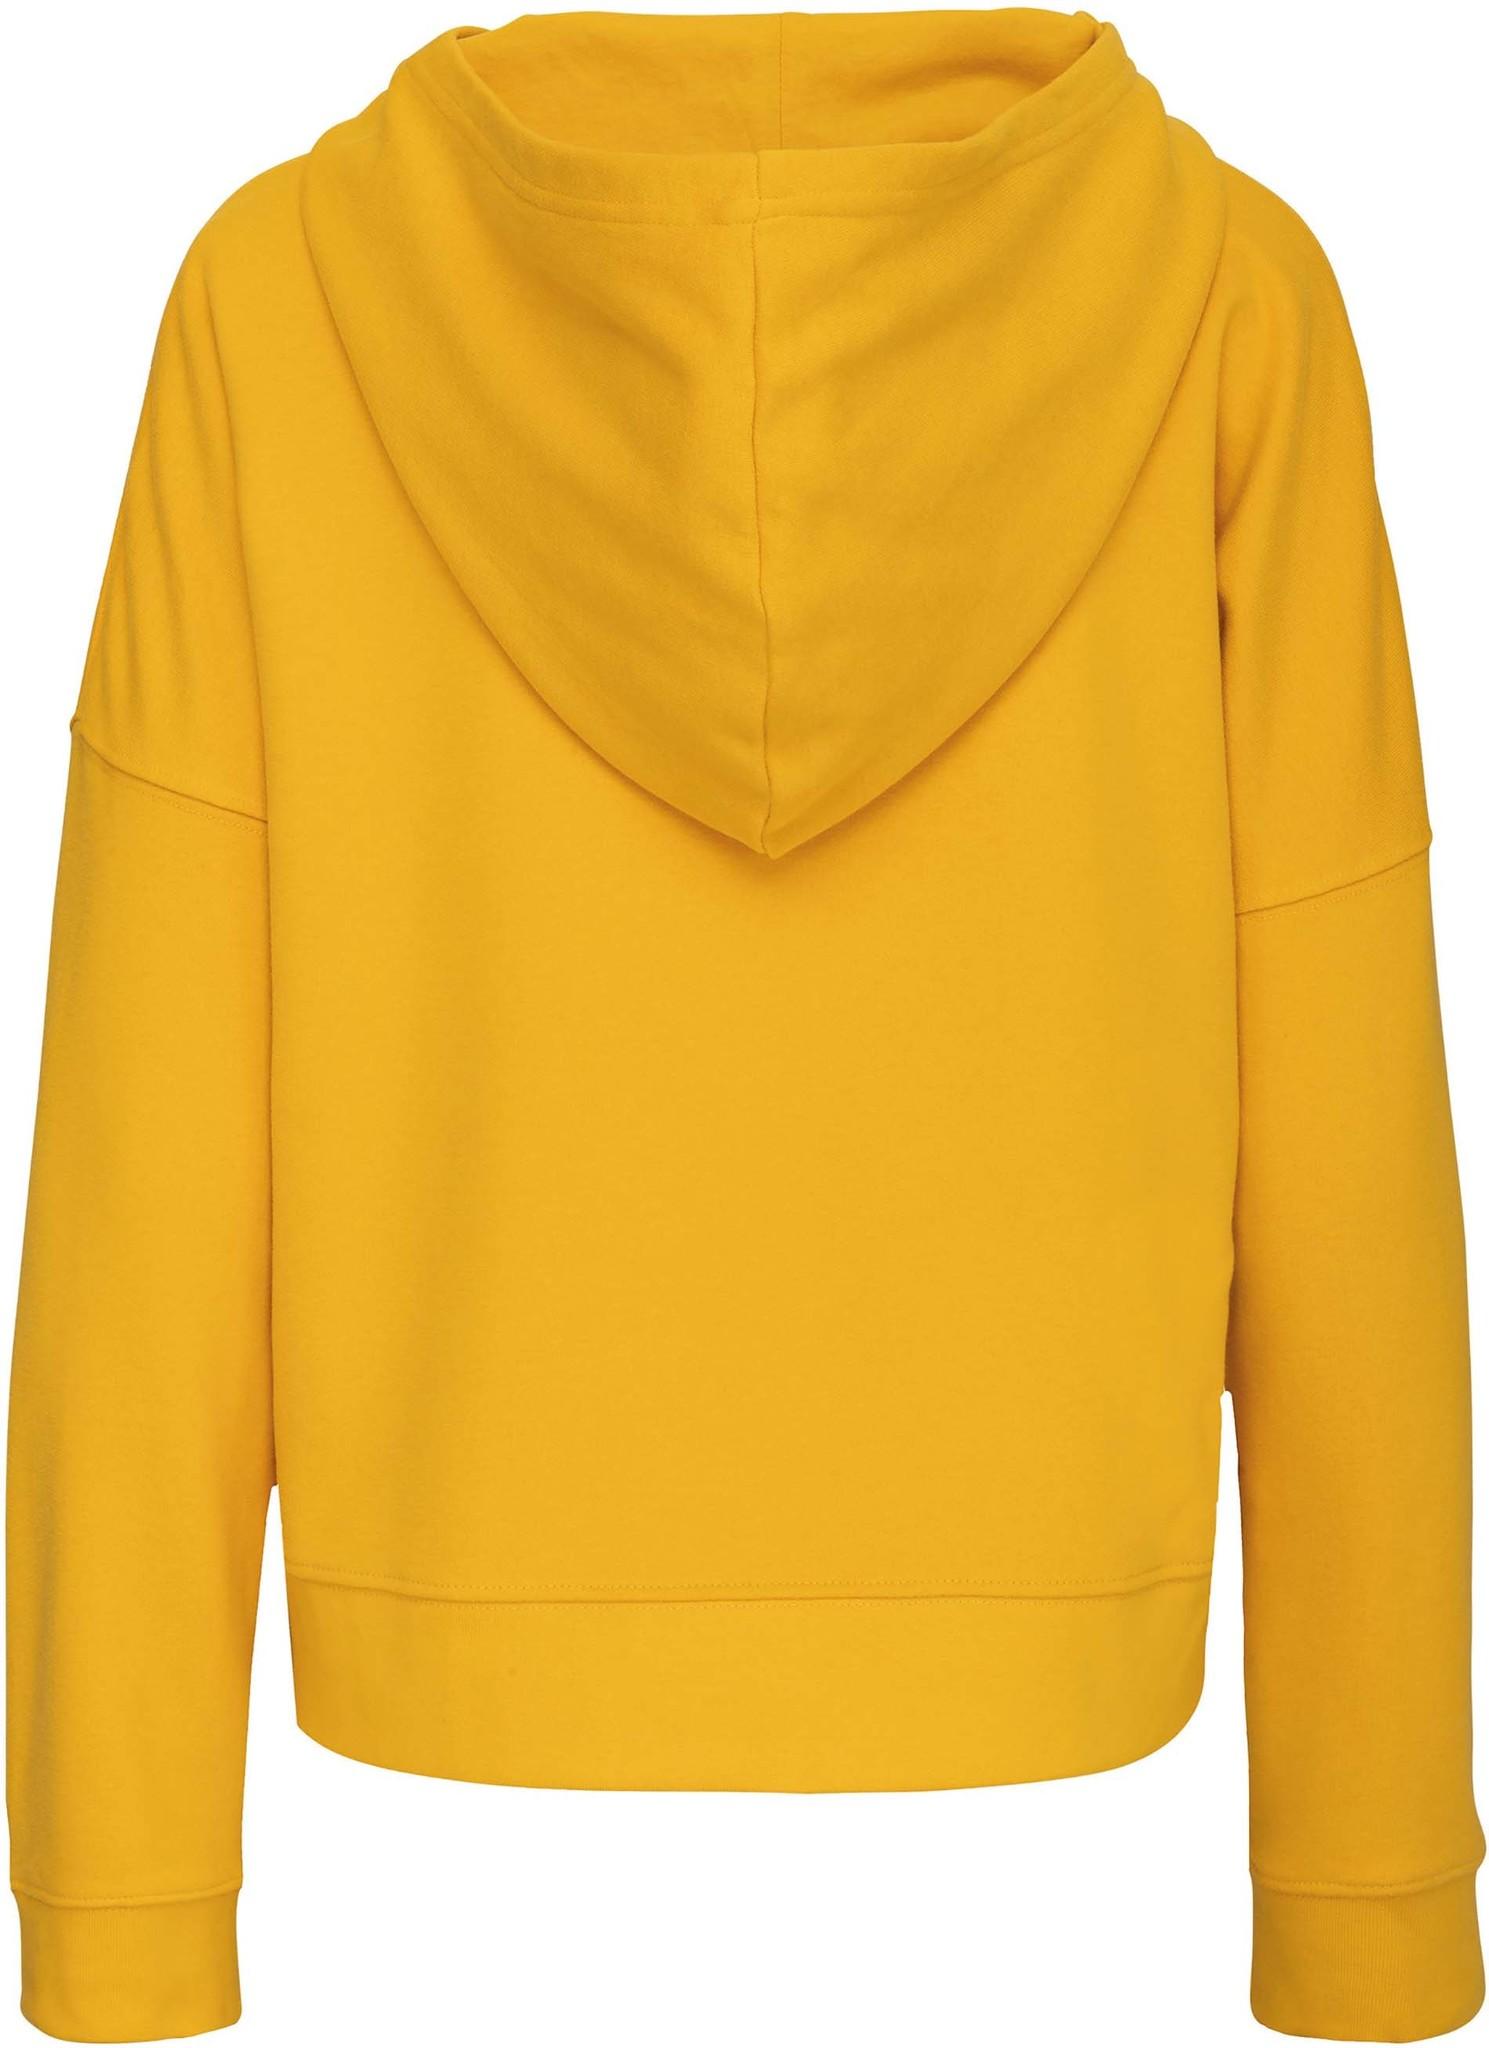 Sloppy Lounge Hoodie Mellow Yellow